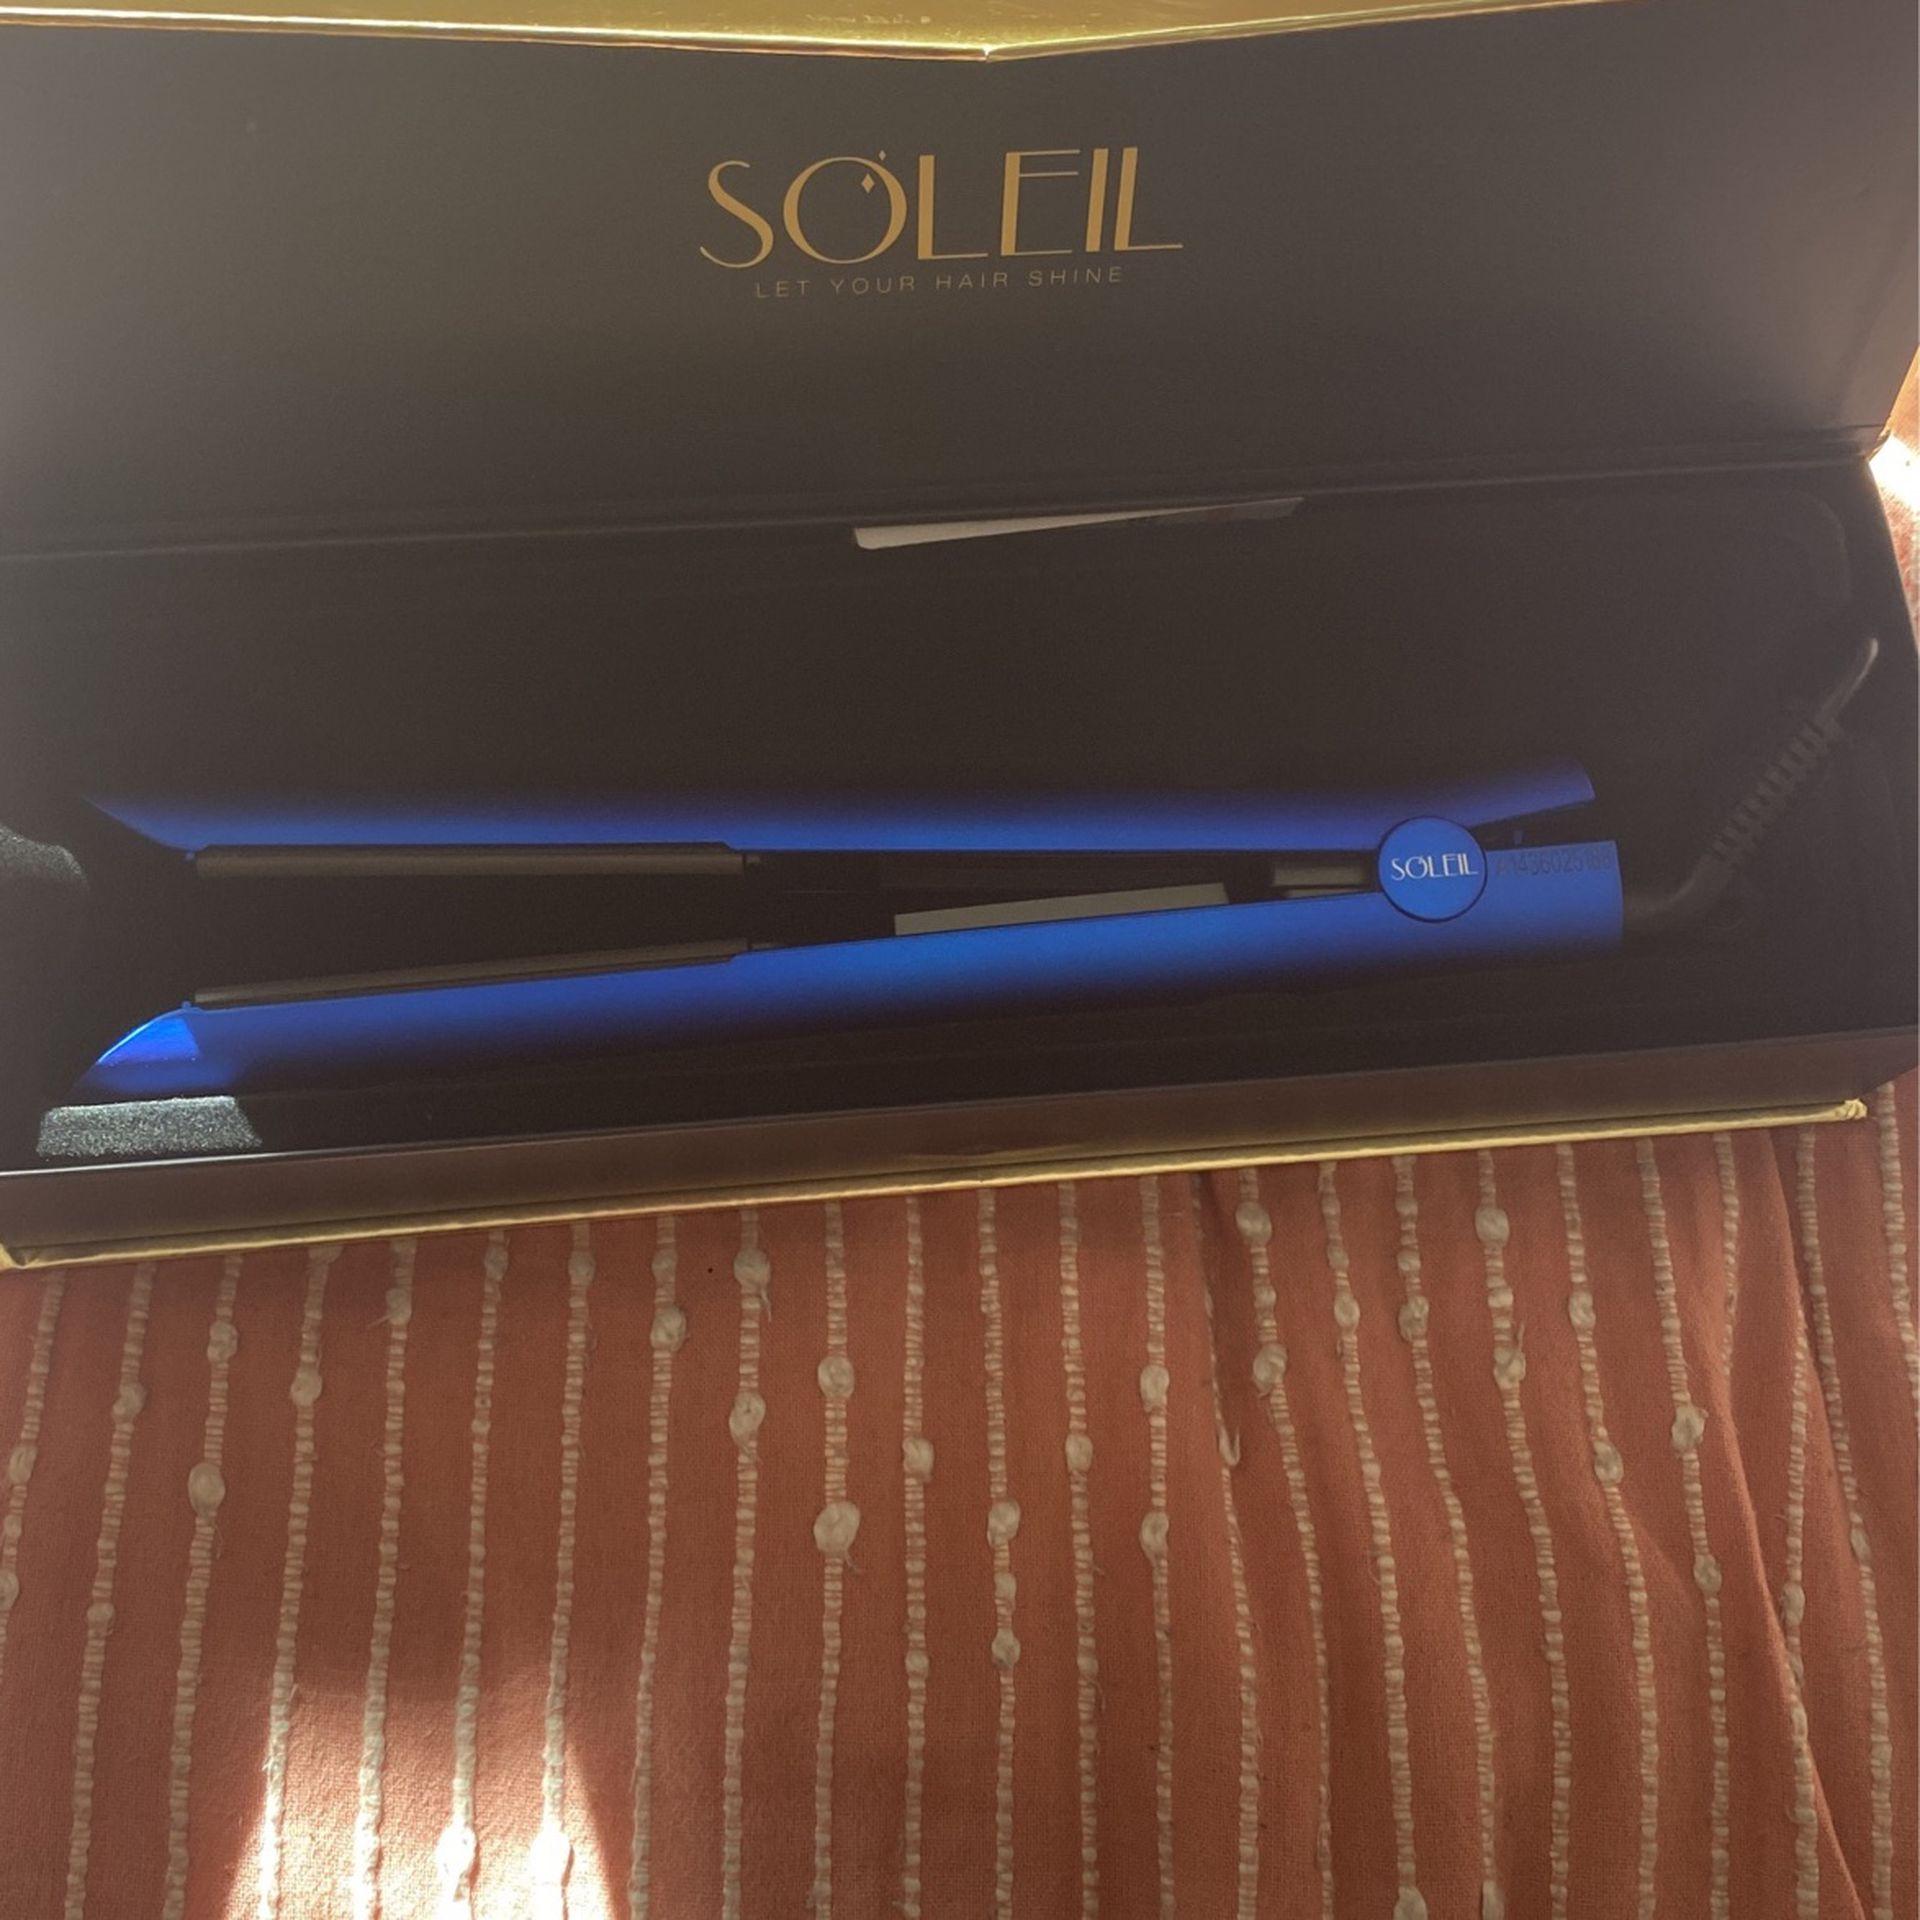 Soleil Flat Iron